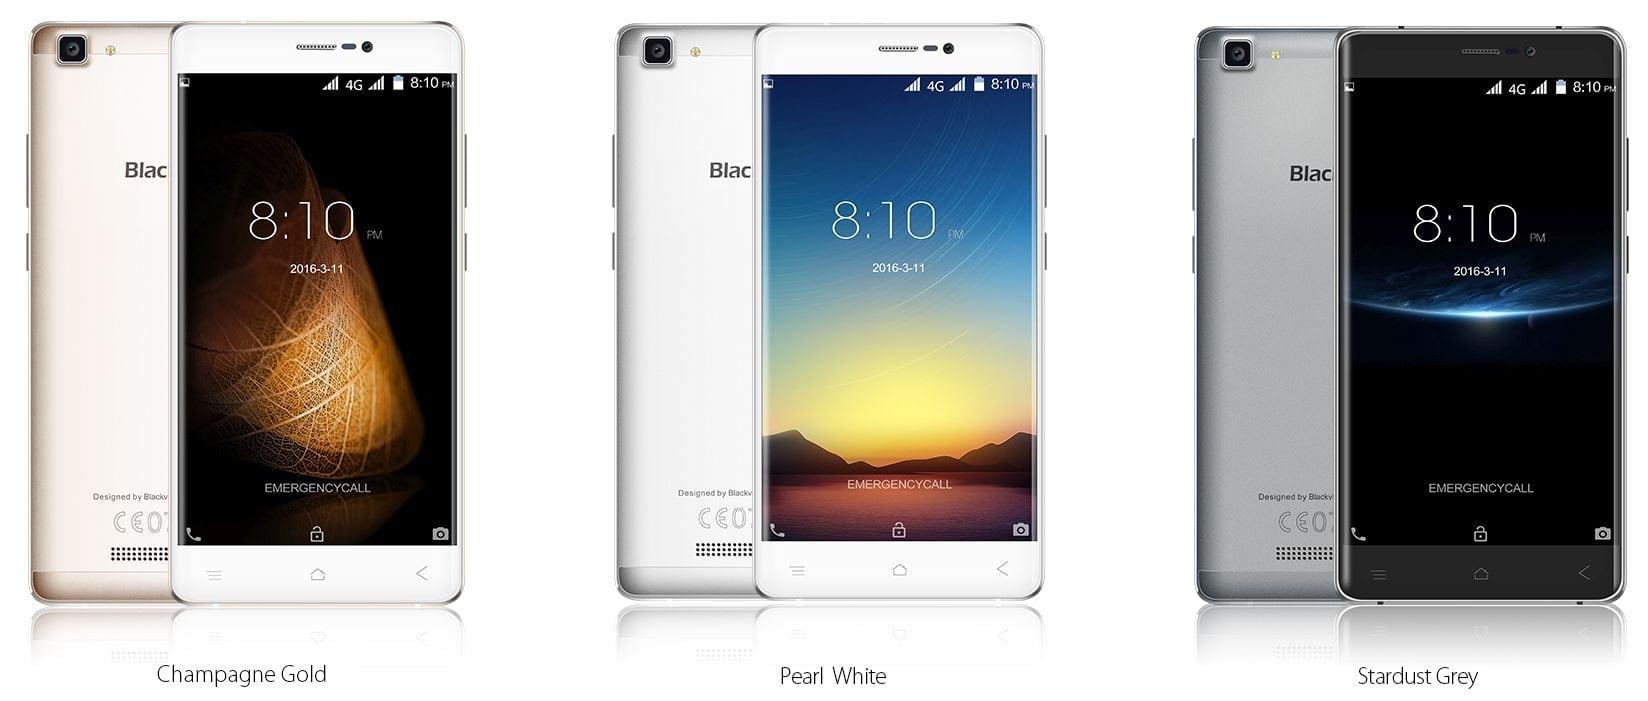 Blackview A8 Max Smartphone